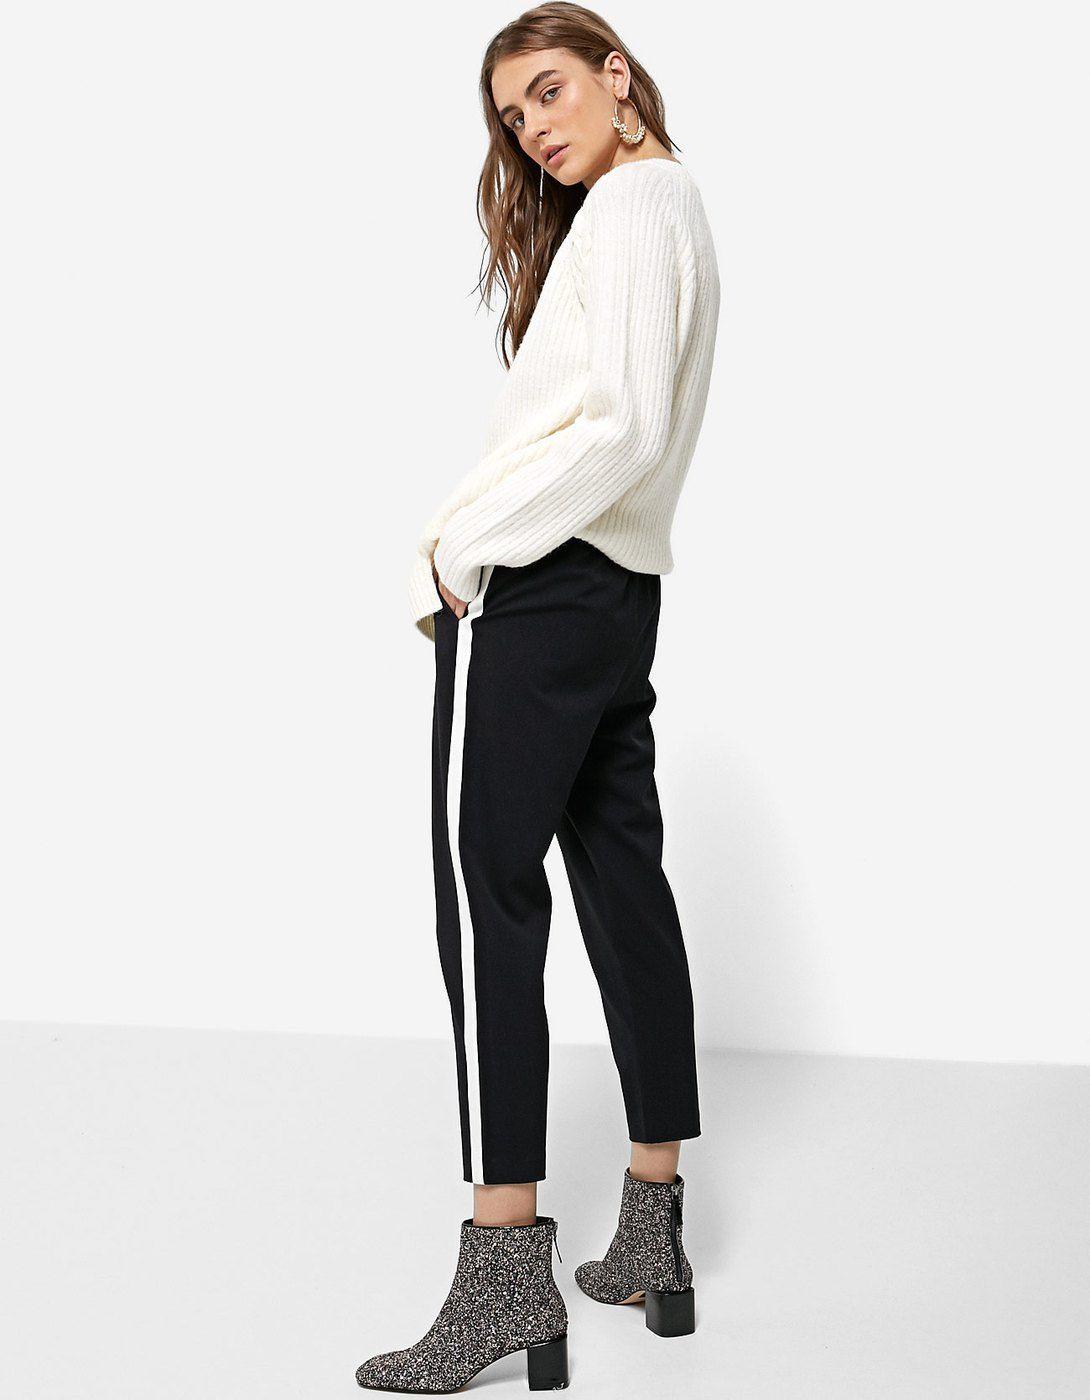 Pantalon negro raya lateral blanca stradivarius